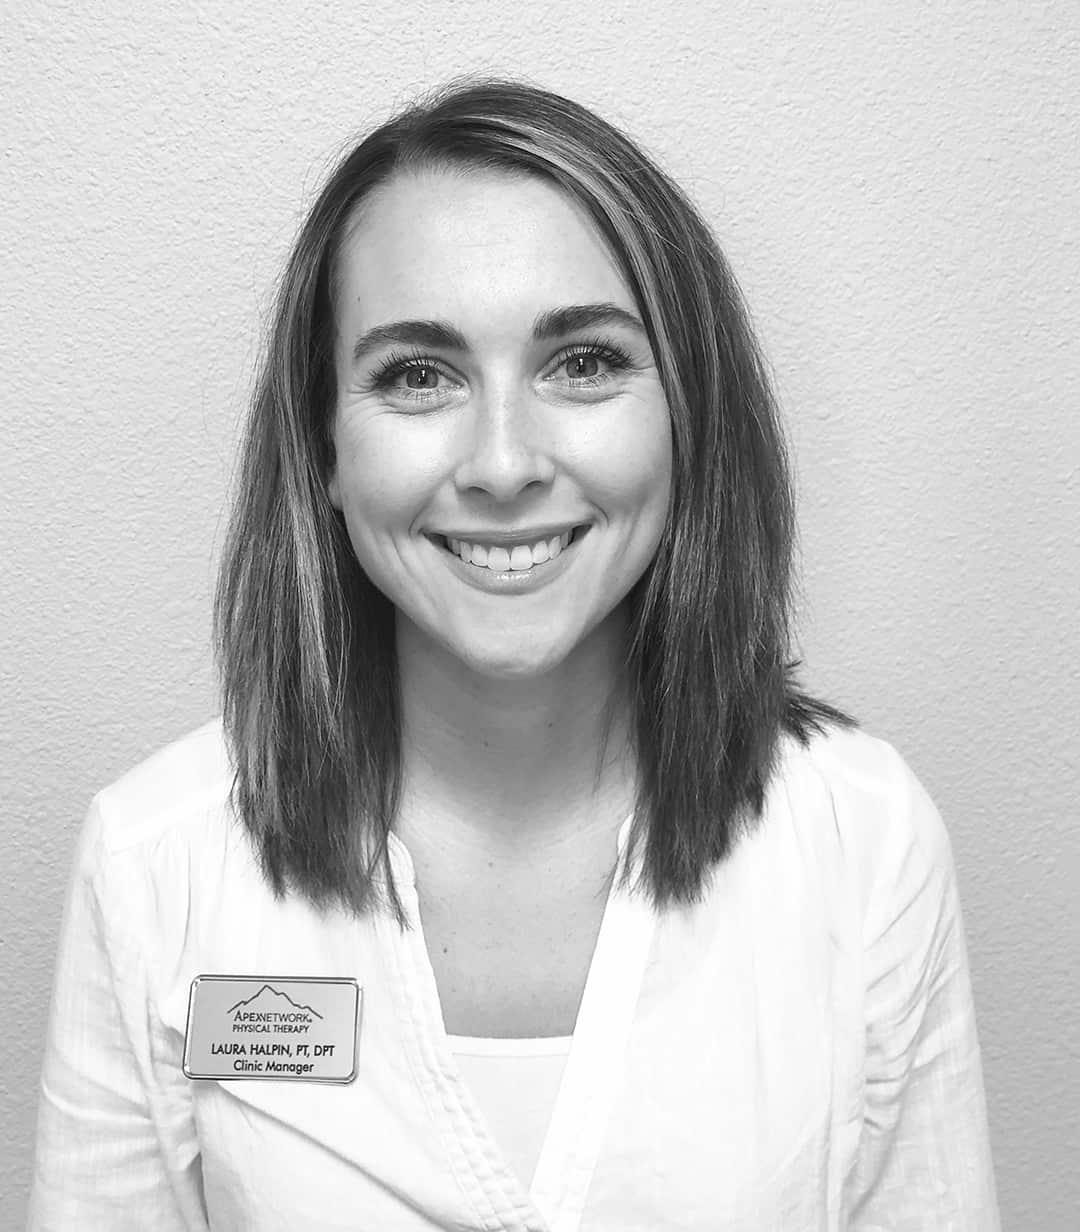 Laura Halpin, DPT, PT, Clinic Manager